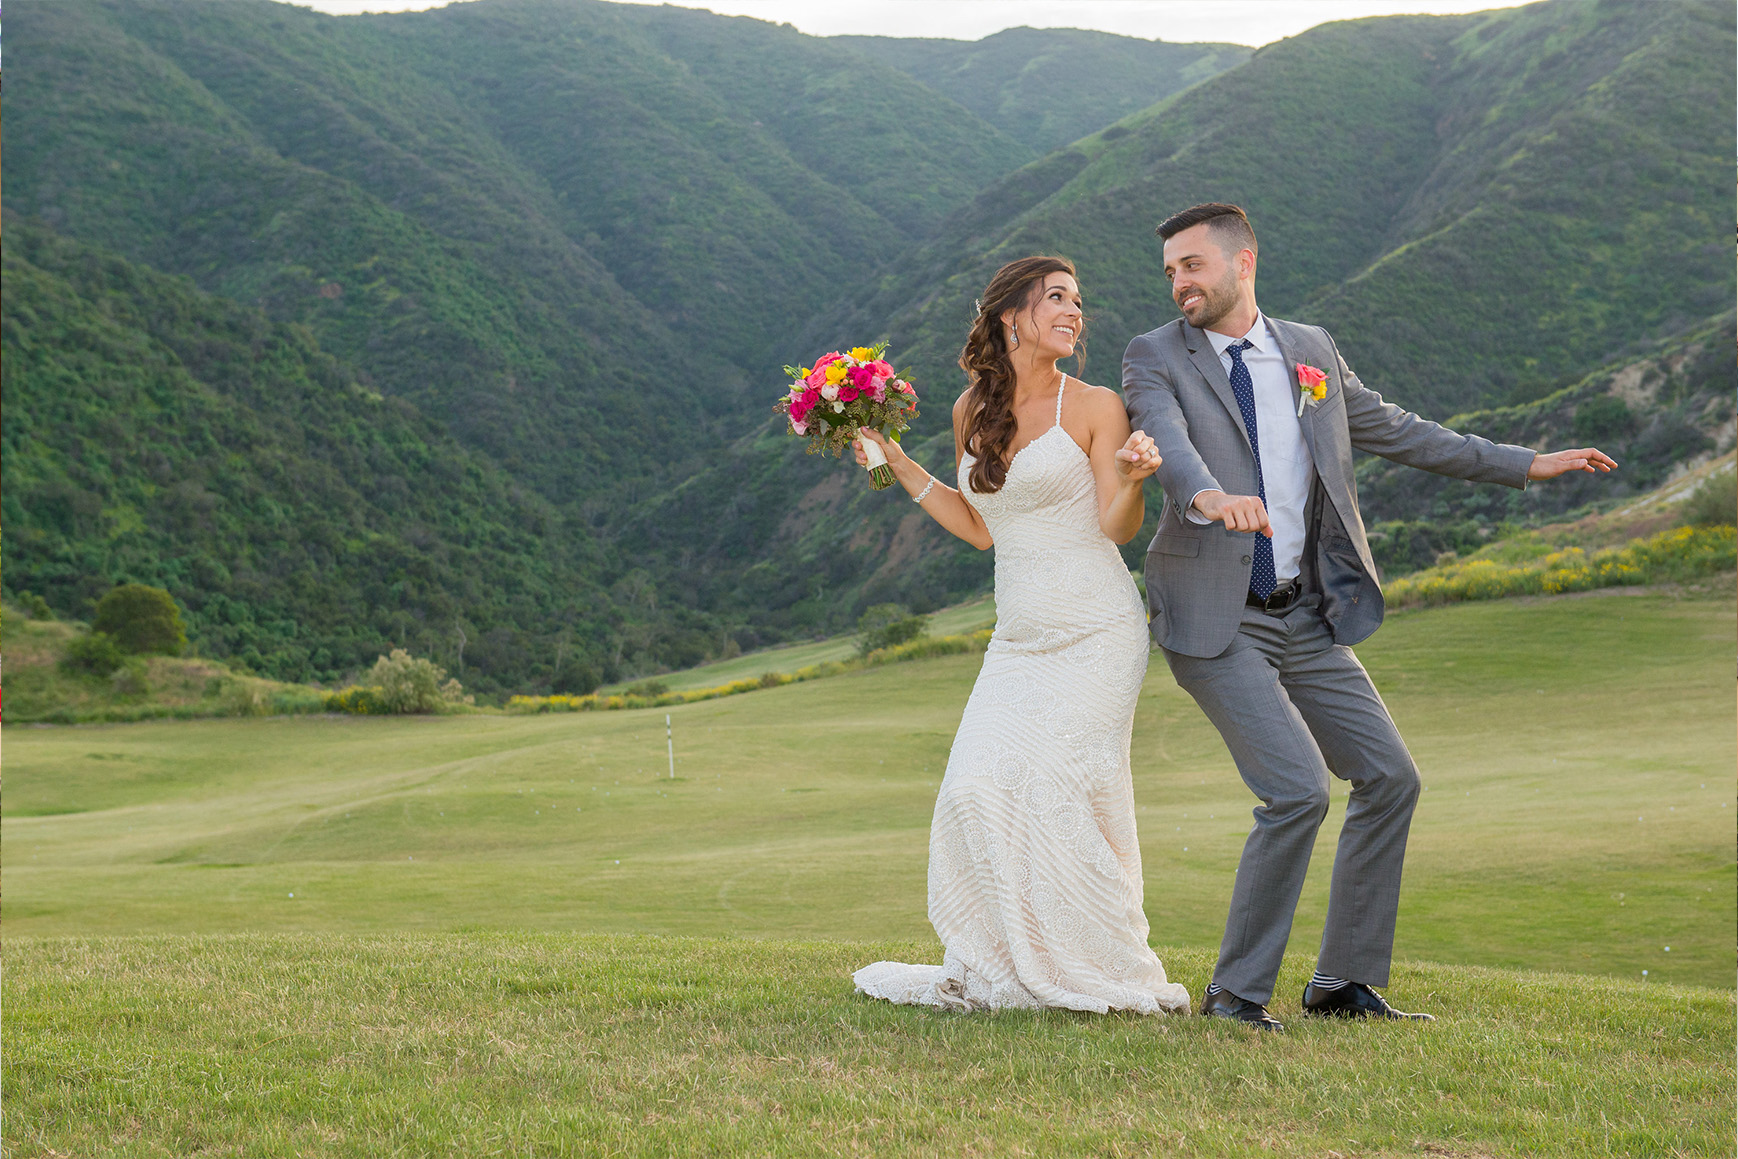 Mountain views - The Retreat - Corona, California - Riverside County - Wedgewood Weddings